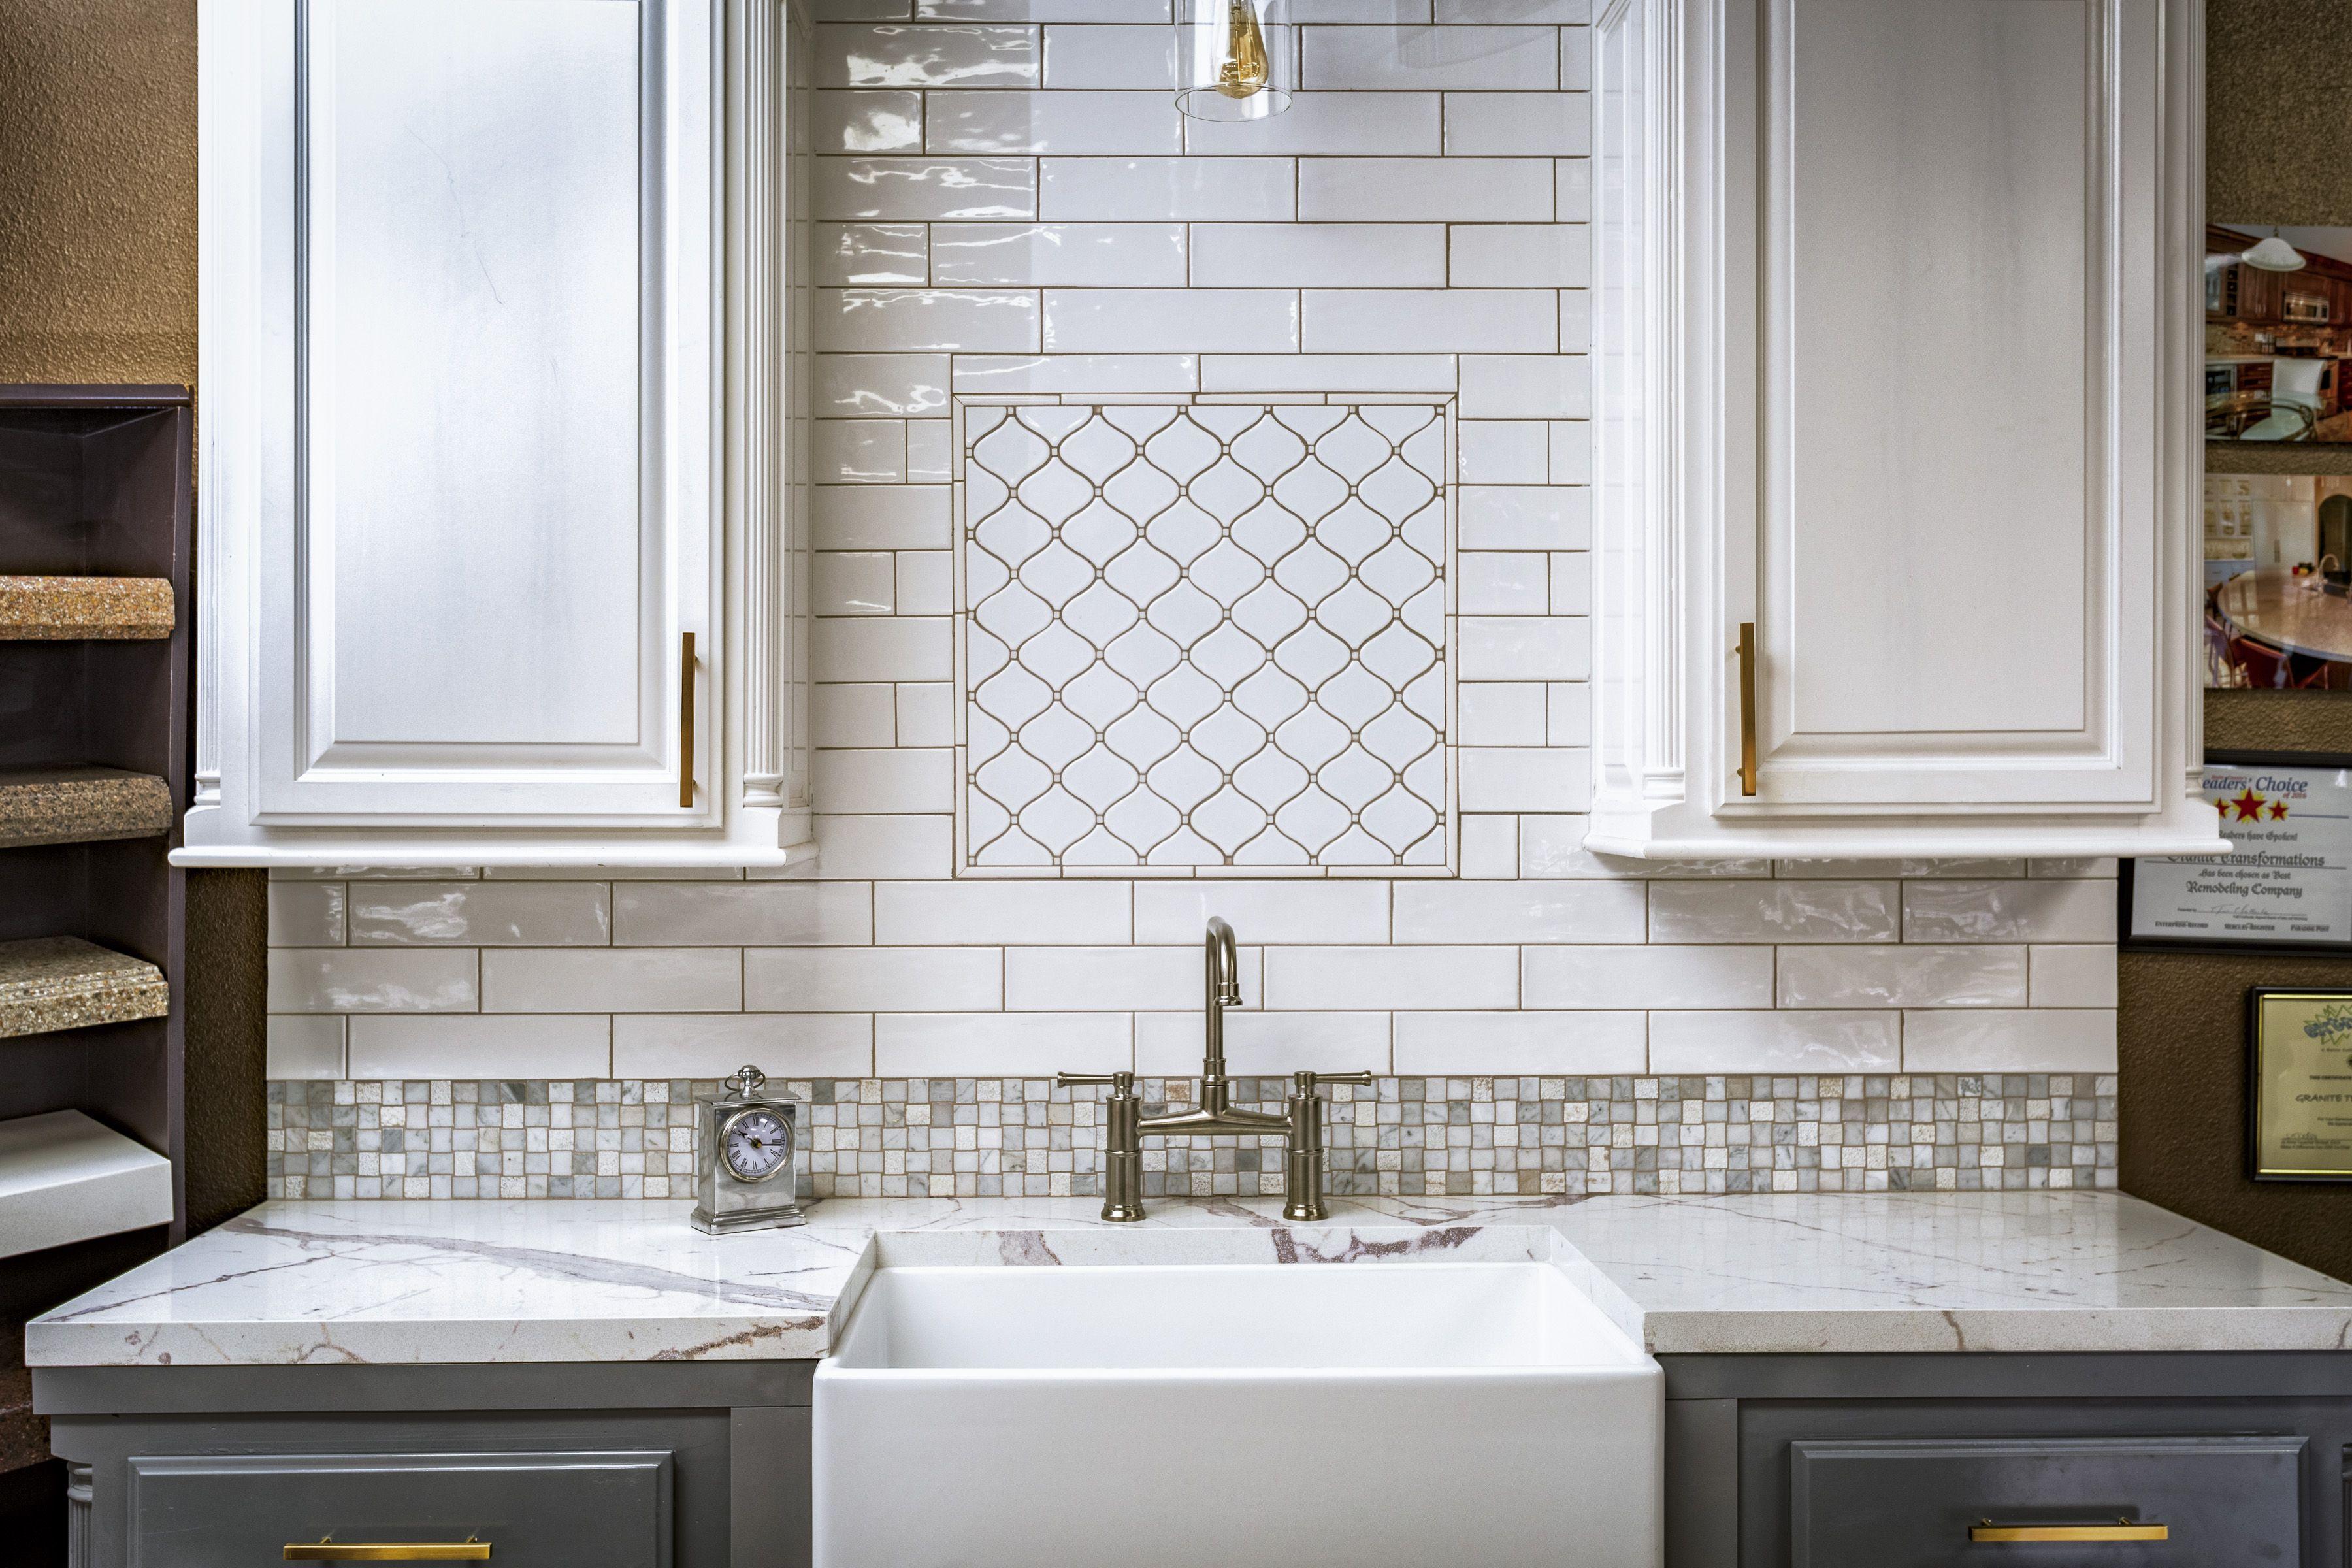 Mto0249 Modern Arabesque White Glazed Ceramic Mosaic Tile